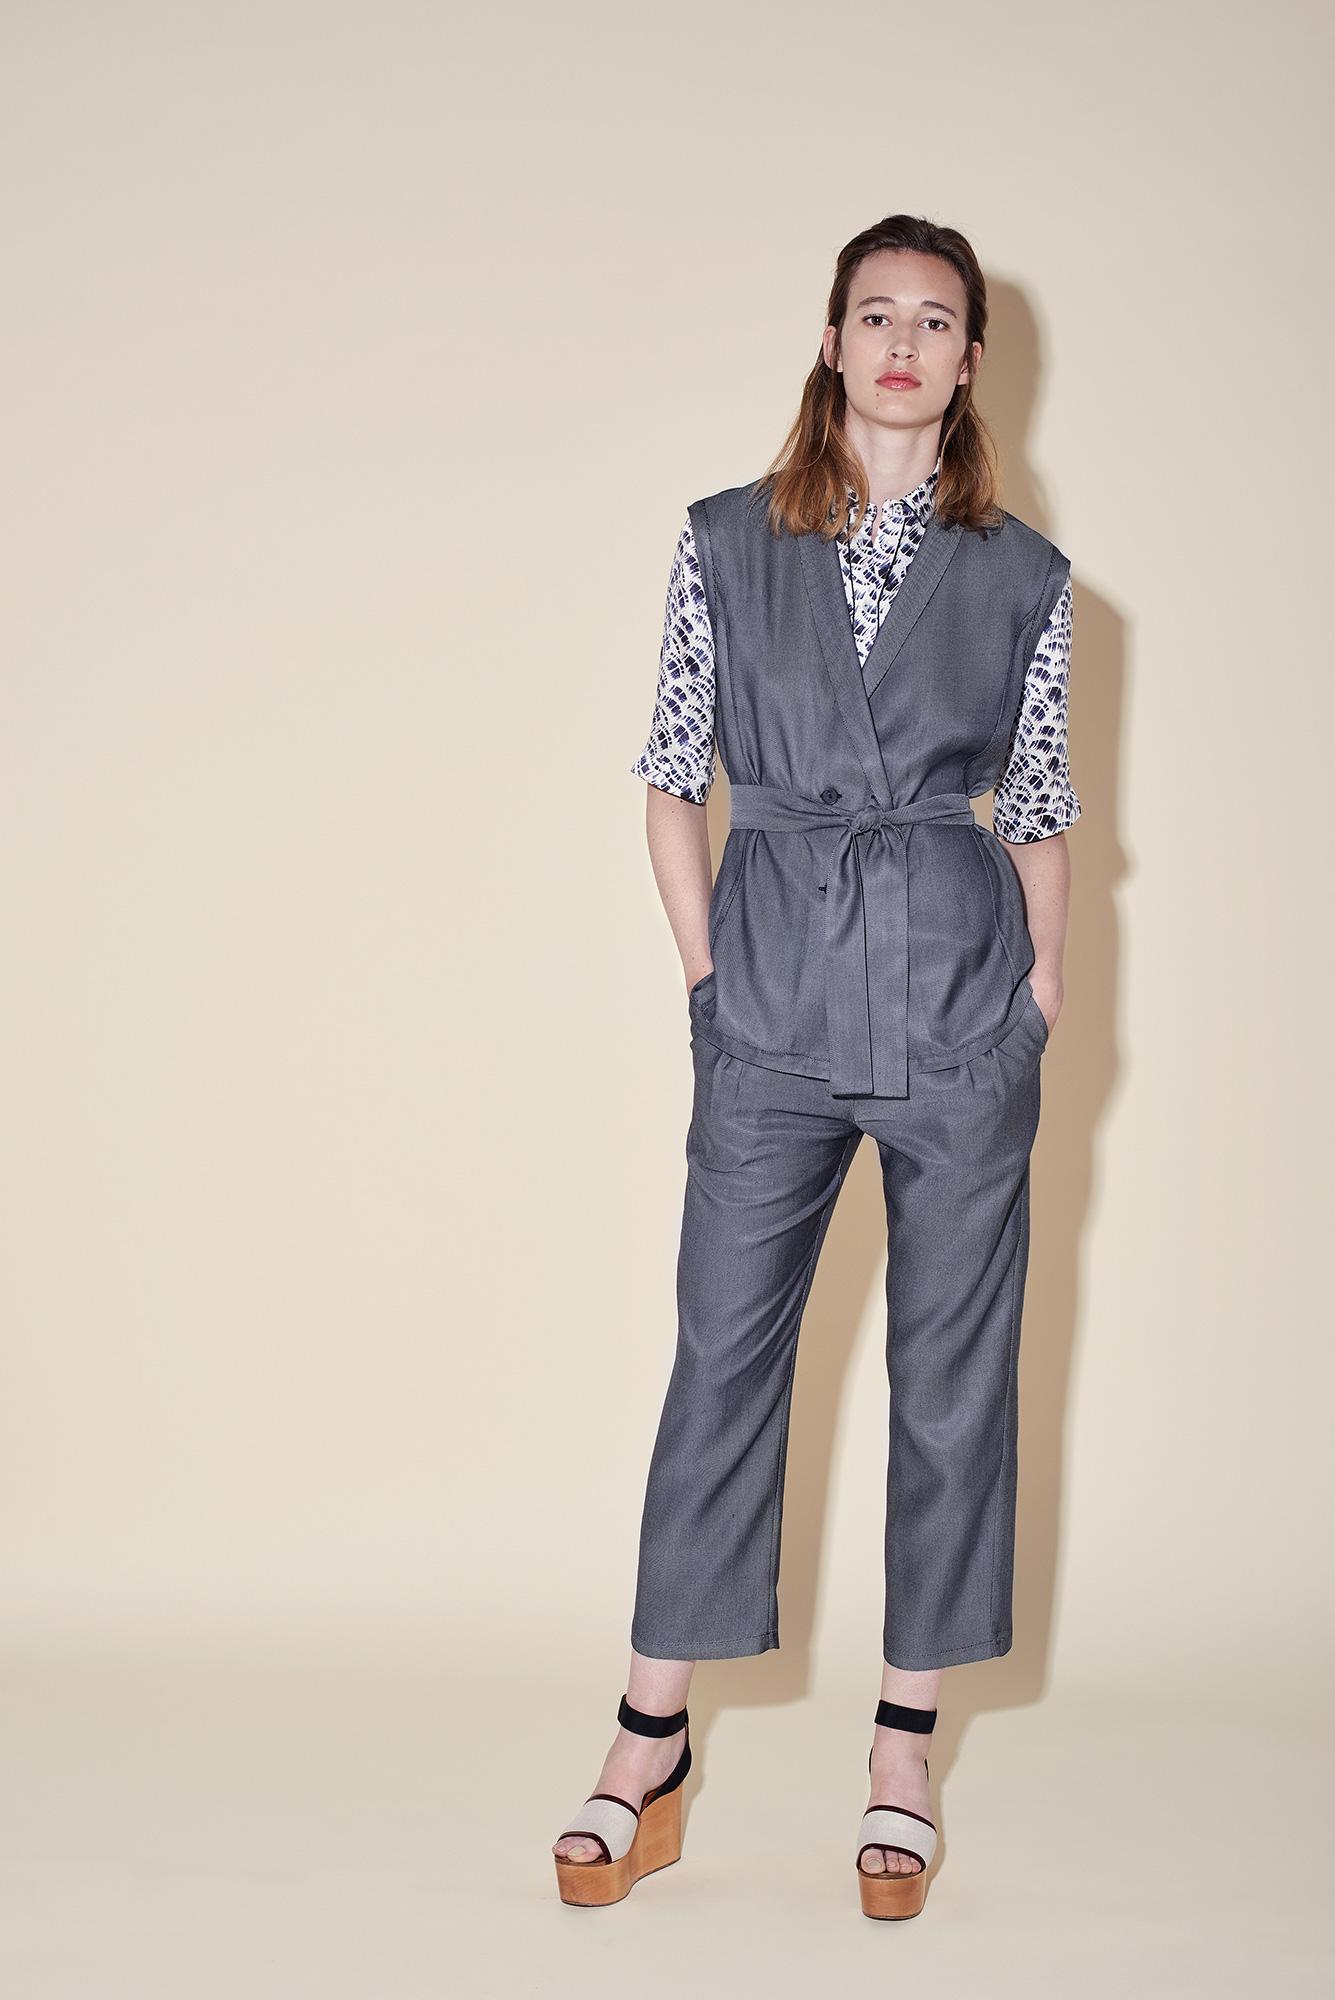 Sleeveless jacket silk denim - Short sleeves shirt silk seersucker small brush - Ankle pant silk denim